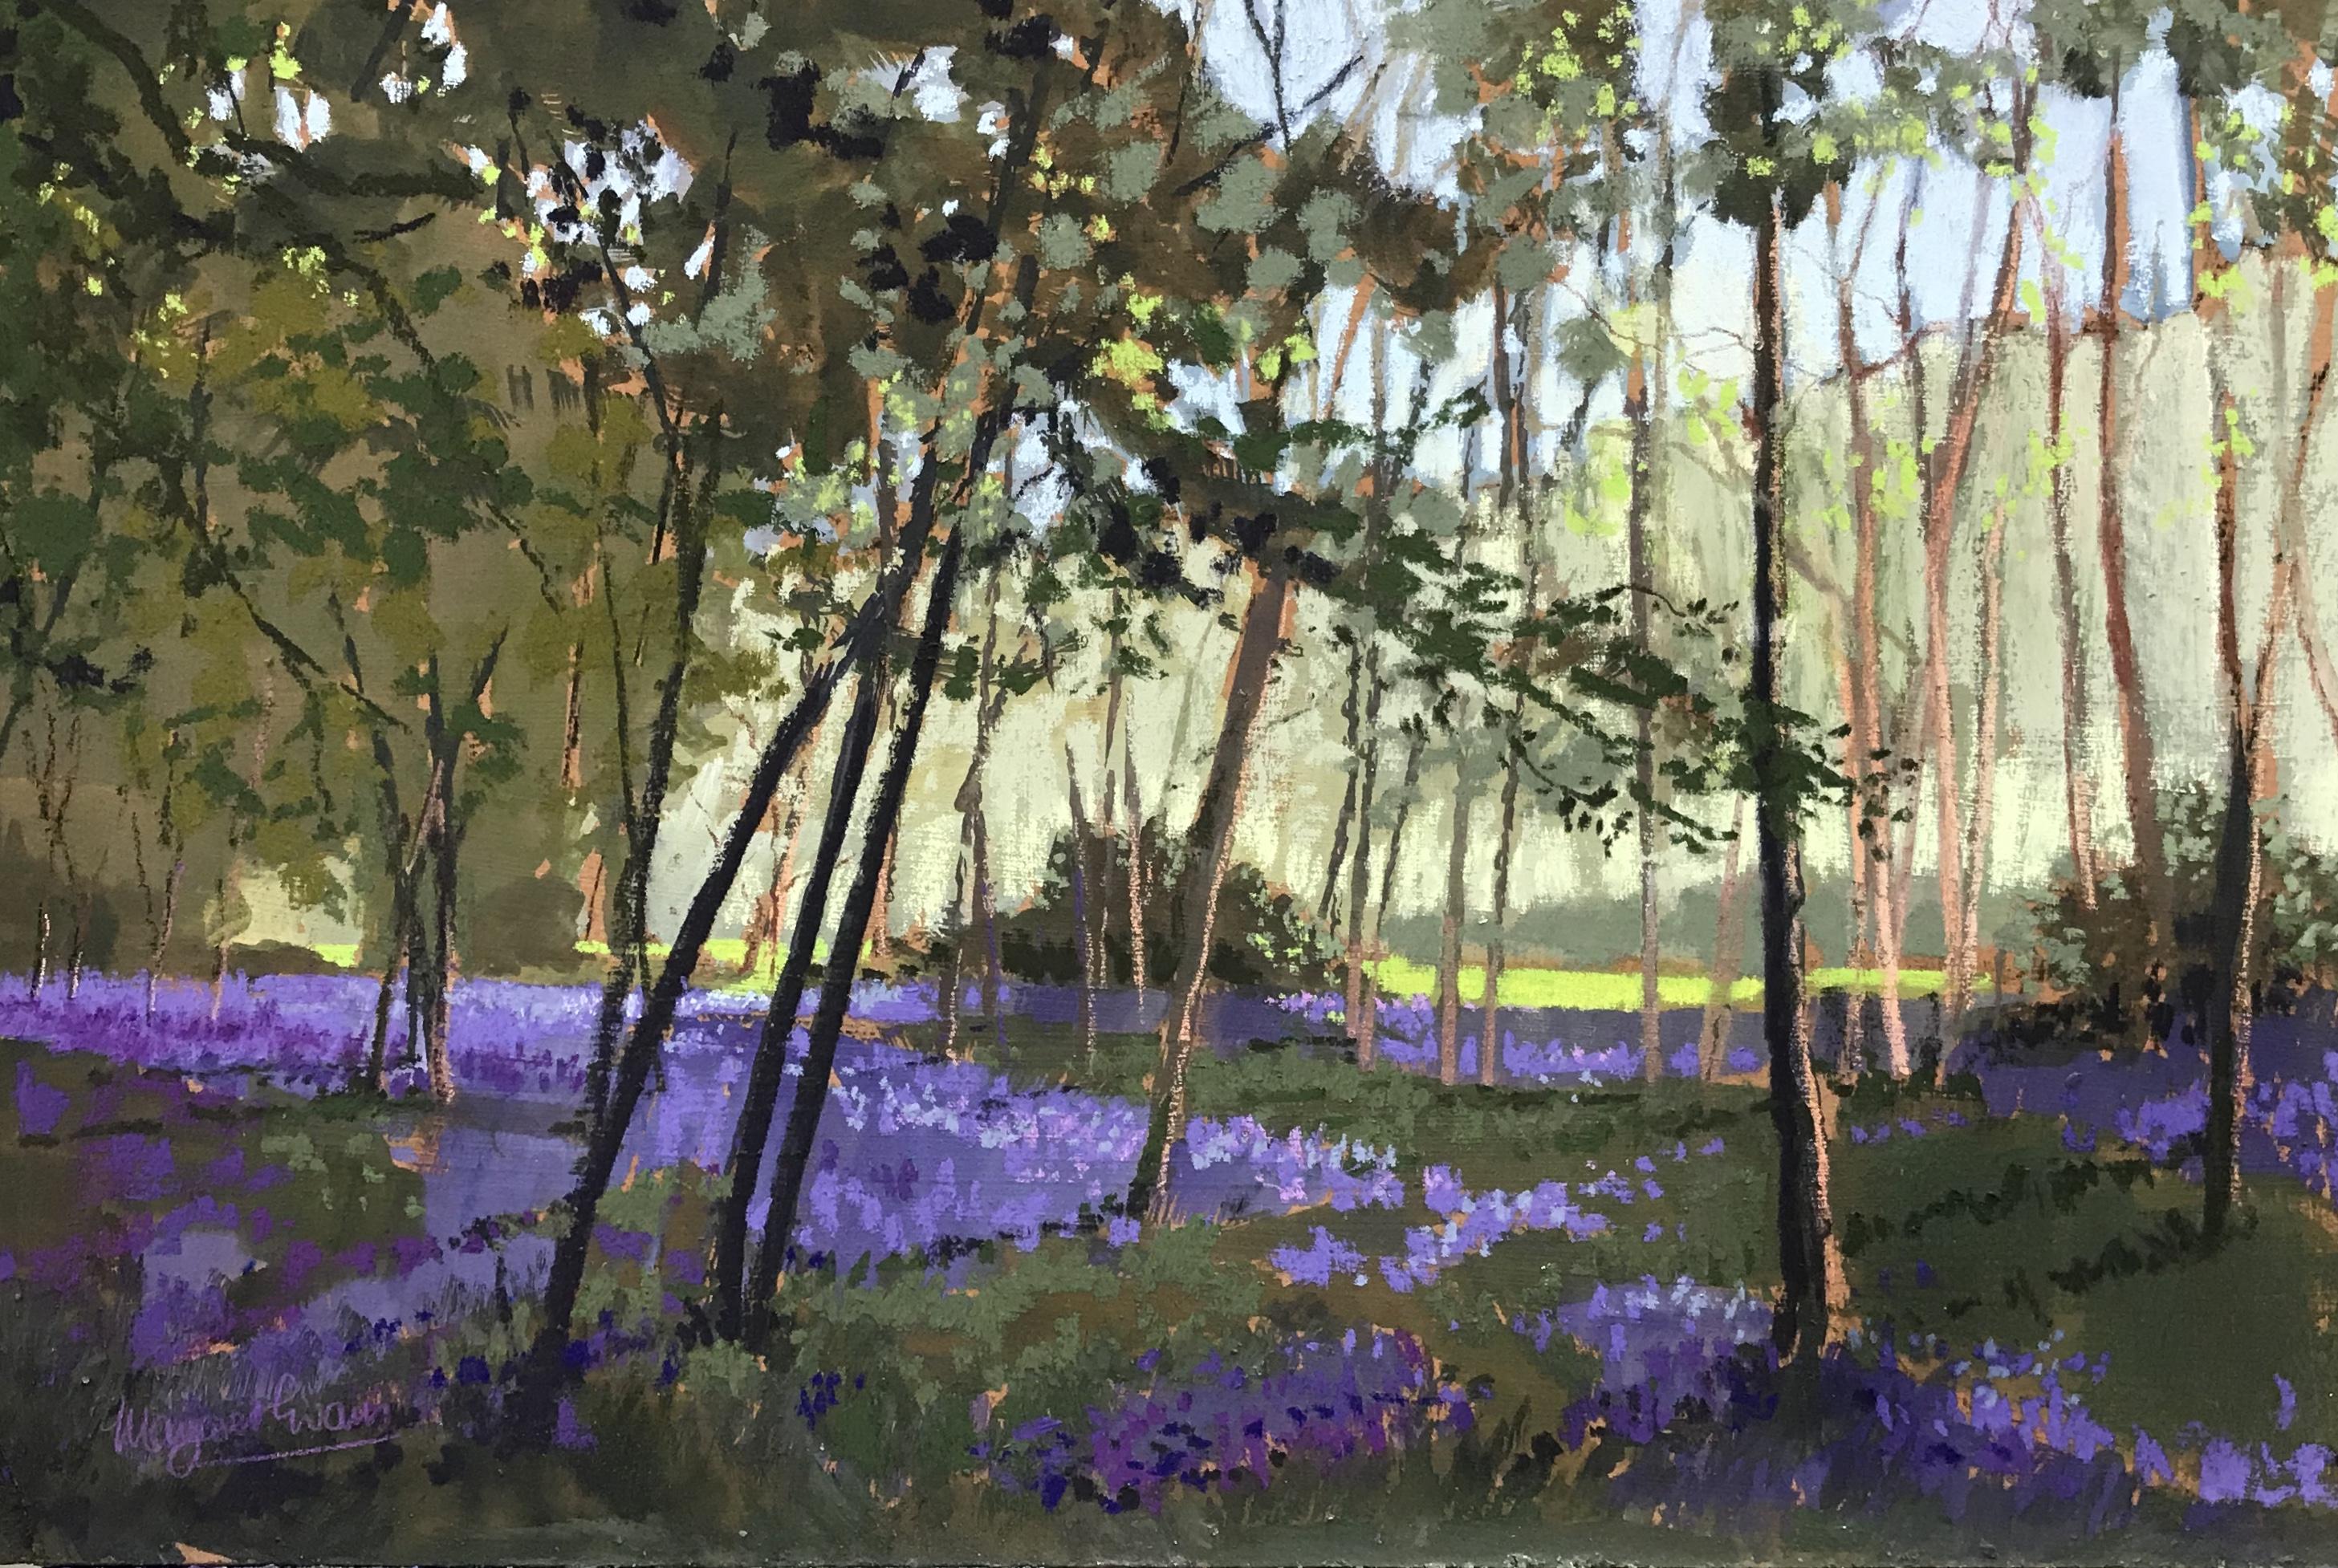 Margaret Evans_Bluebell Woods II_Pastel & Gouache_12x18